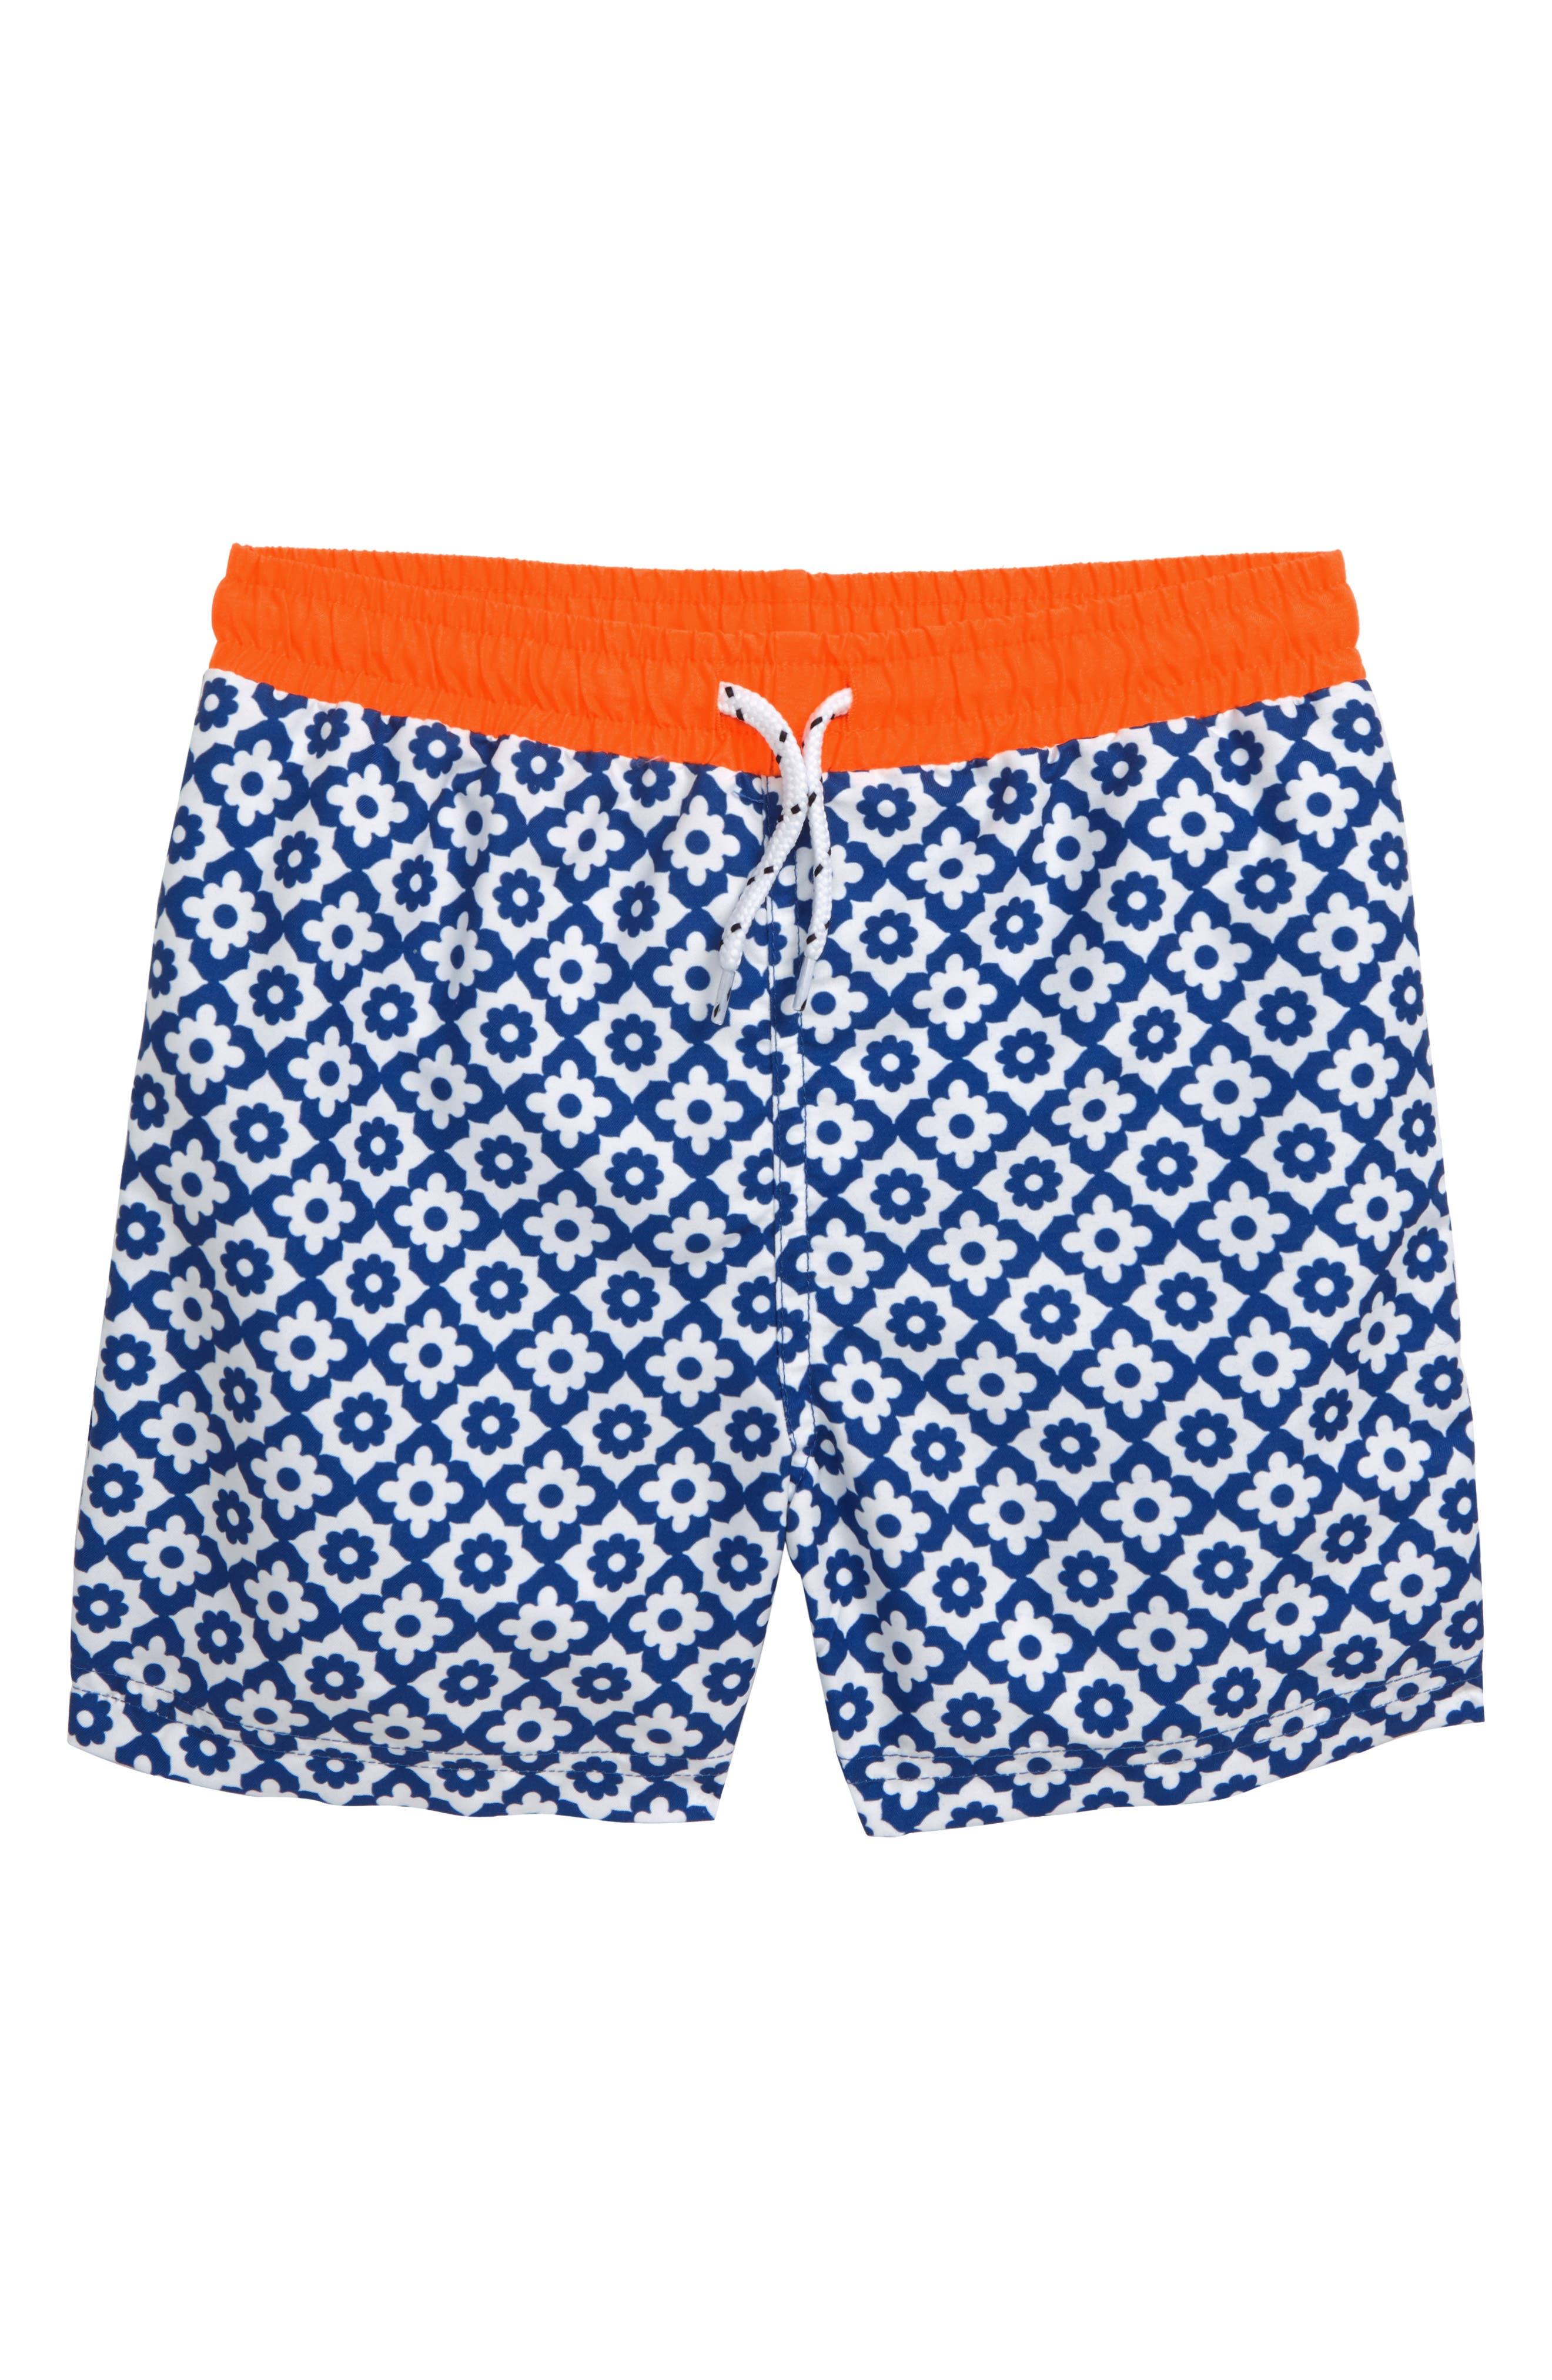 812d52e71b Mini Boden - Boys' Swimwear and Beachwear